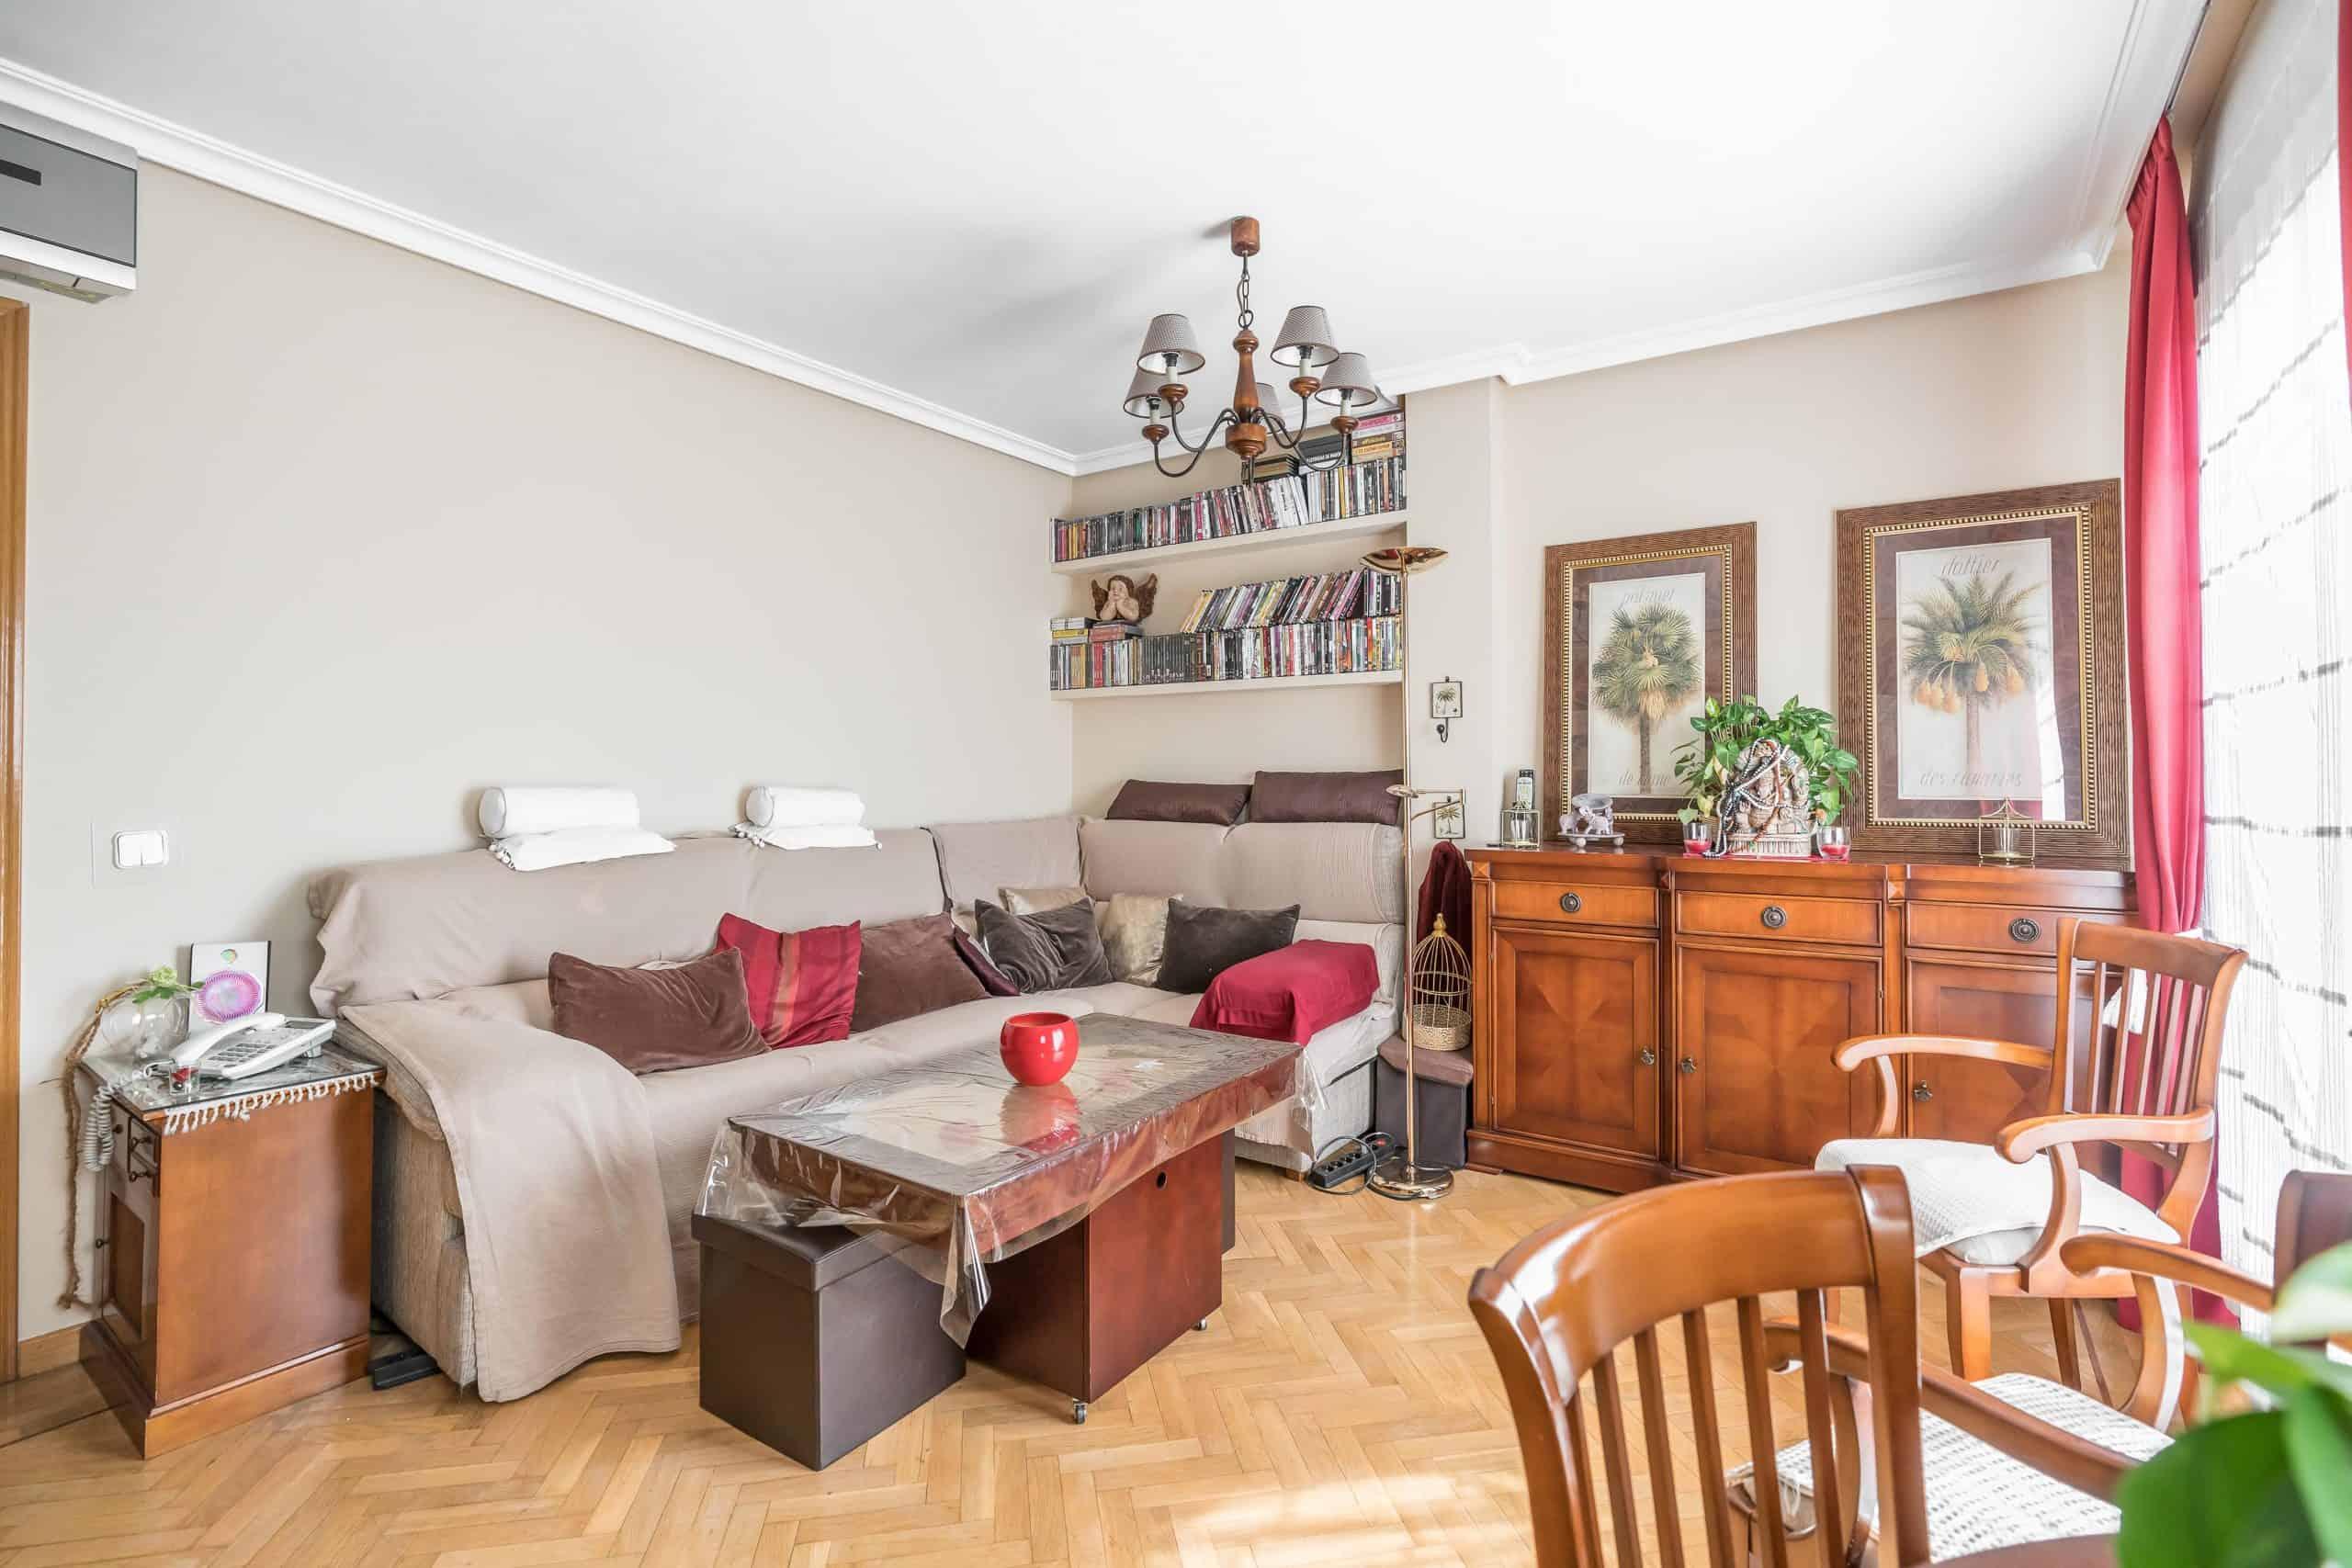 Agencia Inmobiliaria de Madrid-FUTUROCASA-Zona ARGANZUELA-EMBAJADORES-LEGAZPI1 SALON (3)